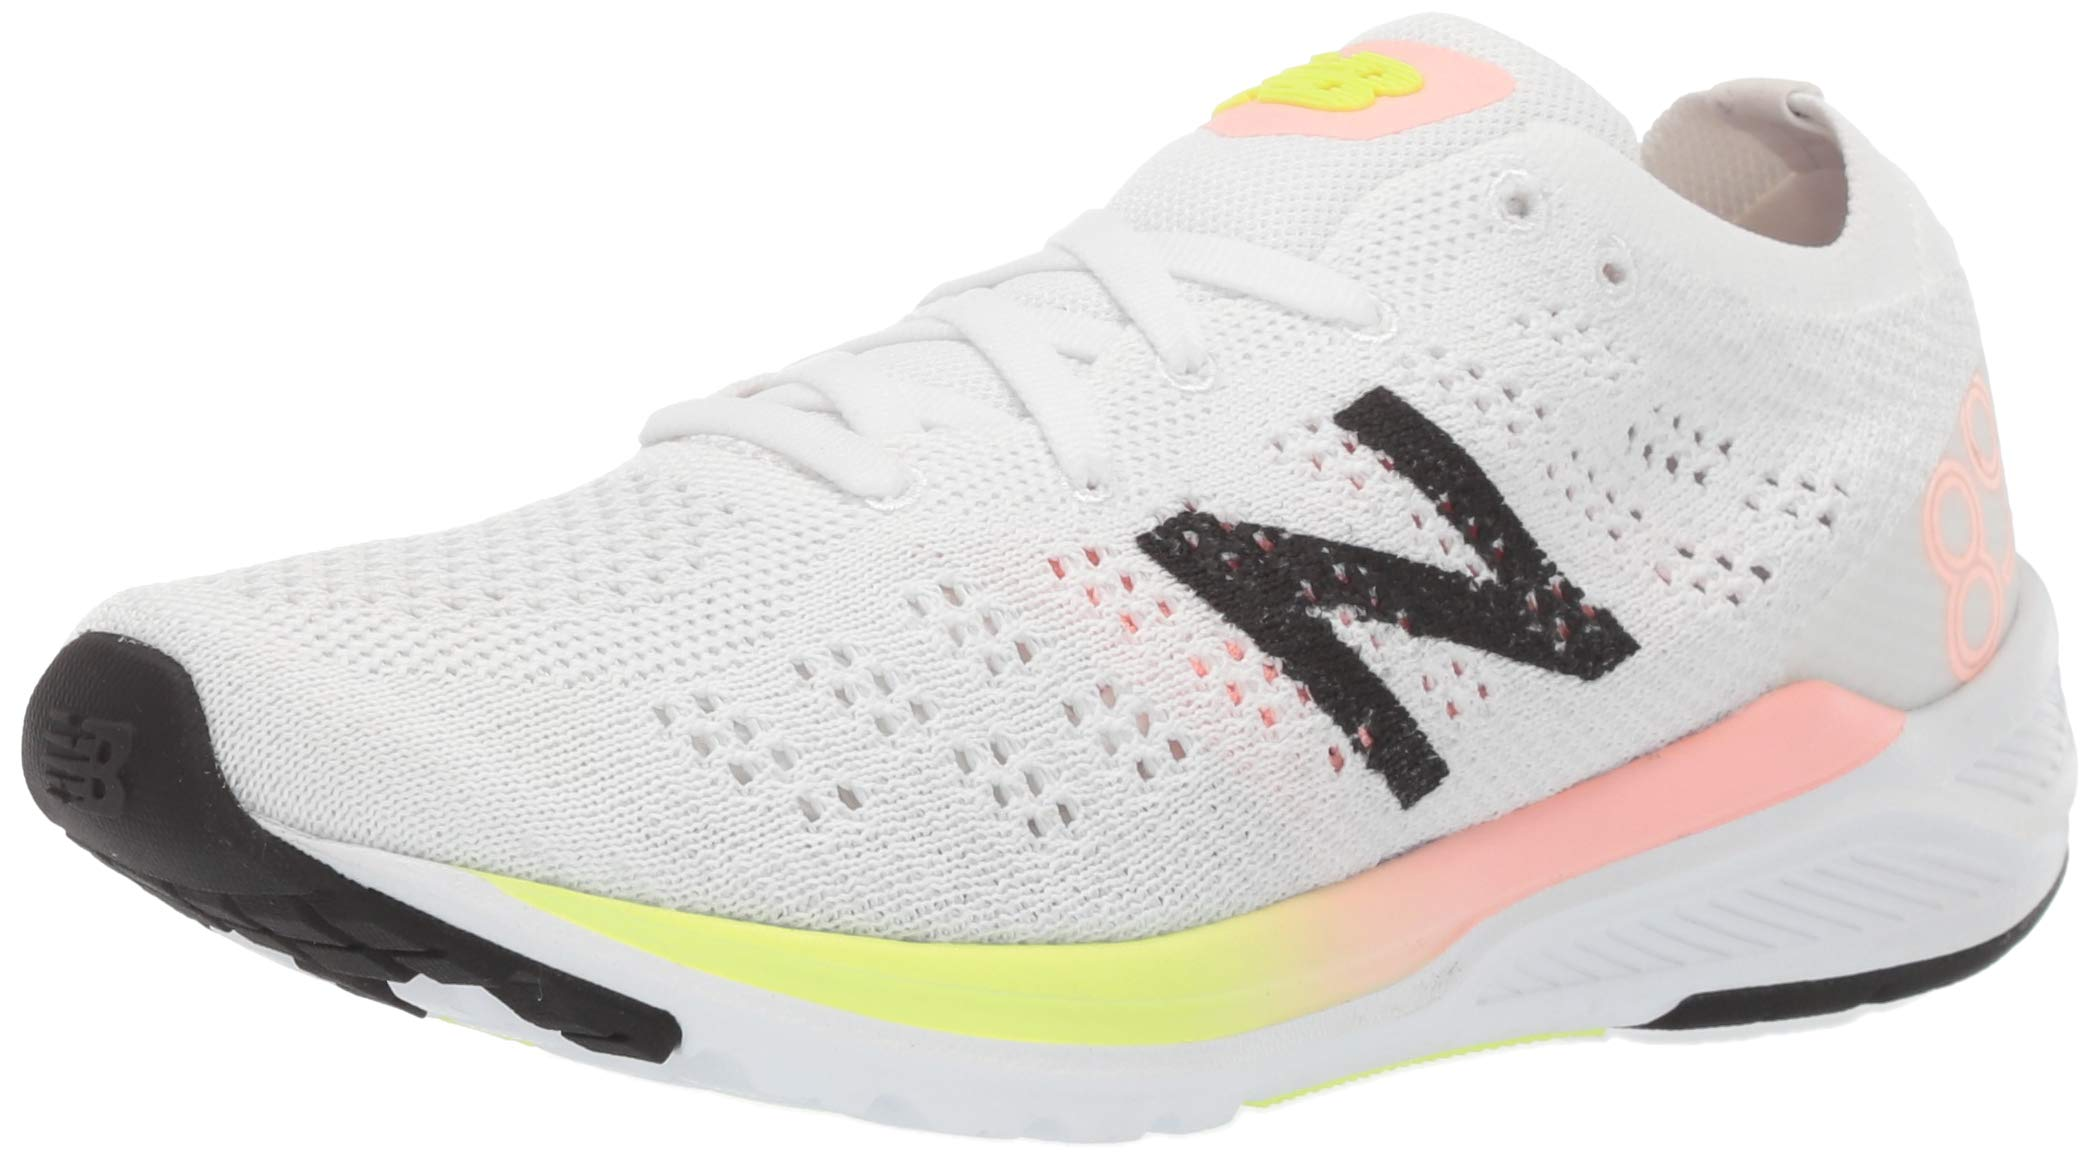 New Balance Women's 890v7 Running Shoe, White/Guava Bleached Lime GLO, 5 B US